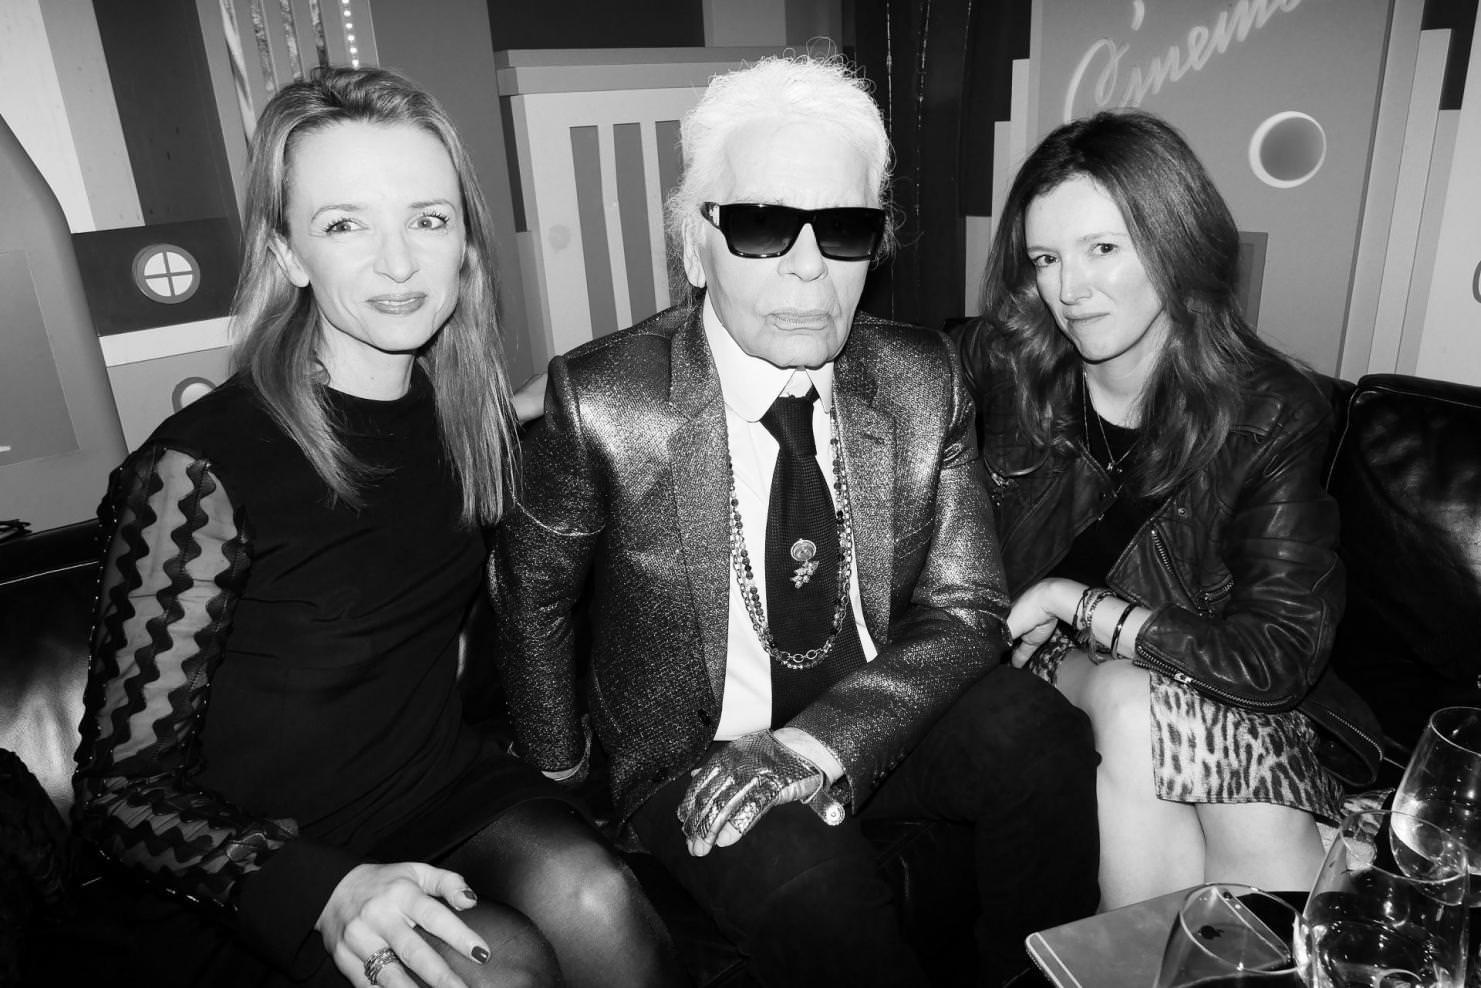 Delphine Arnault, Karl Lagerfeld and Clare Waight Keller